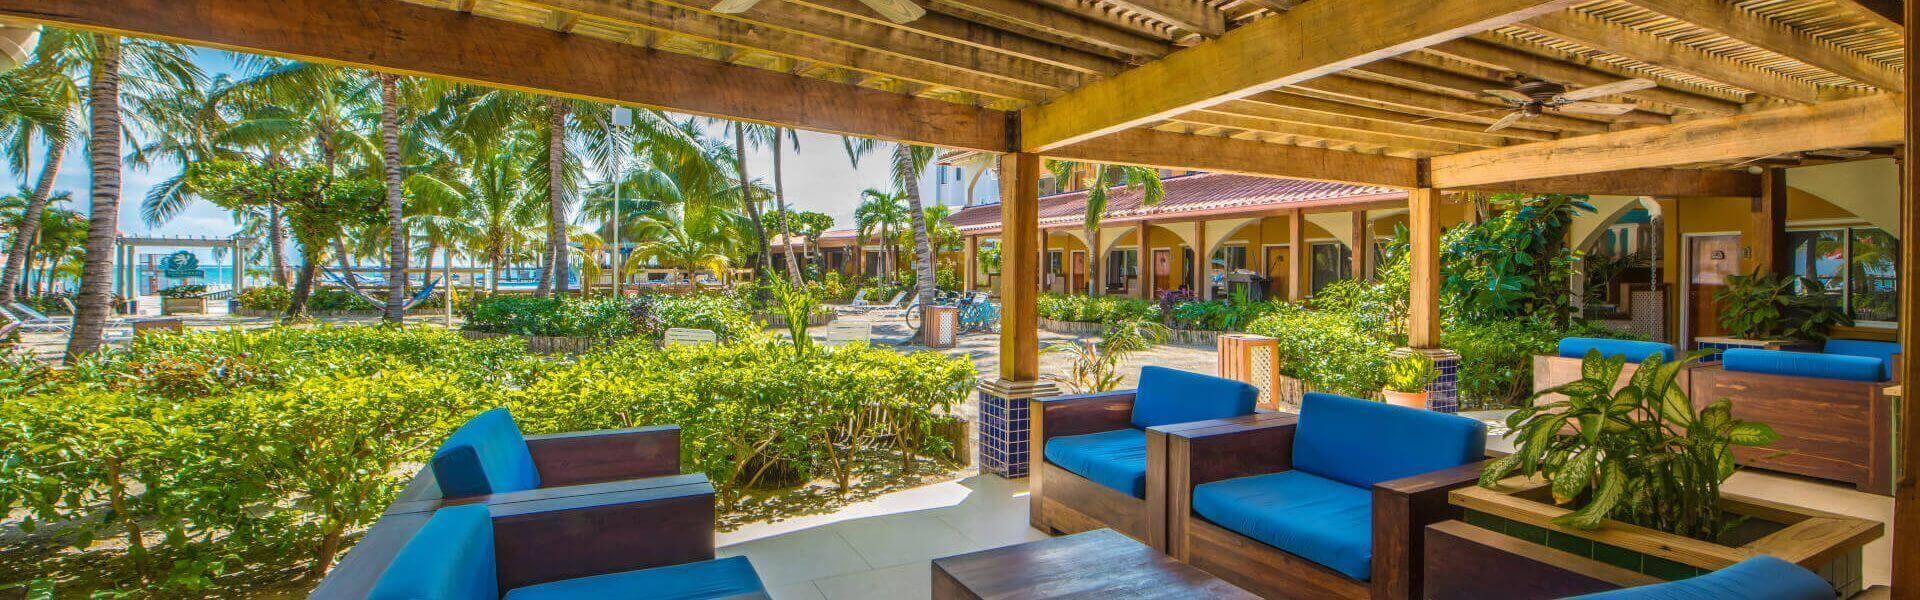 Sunbreeze Courtyard Lounge San Pedro